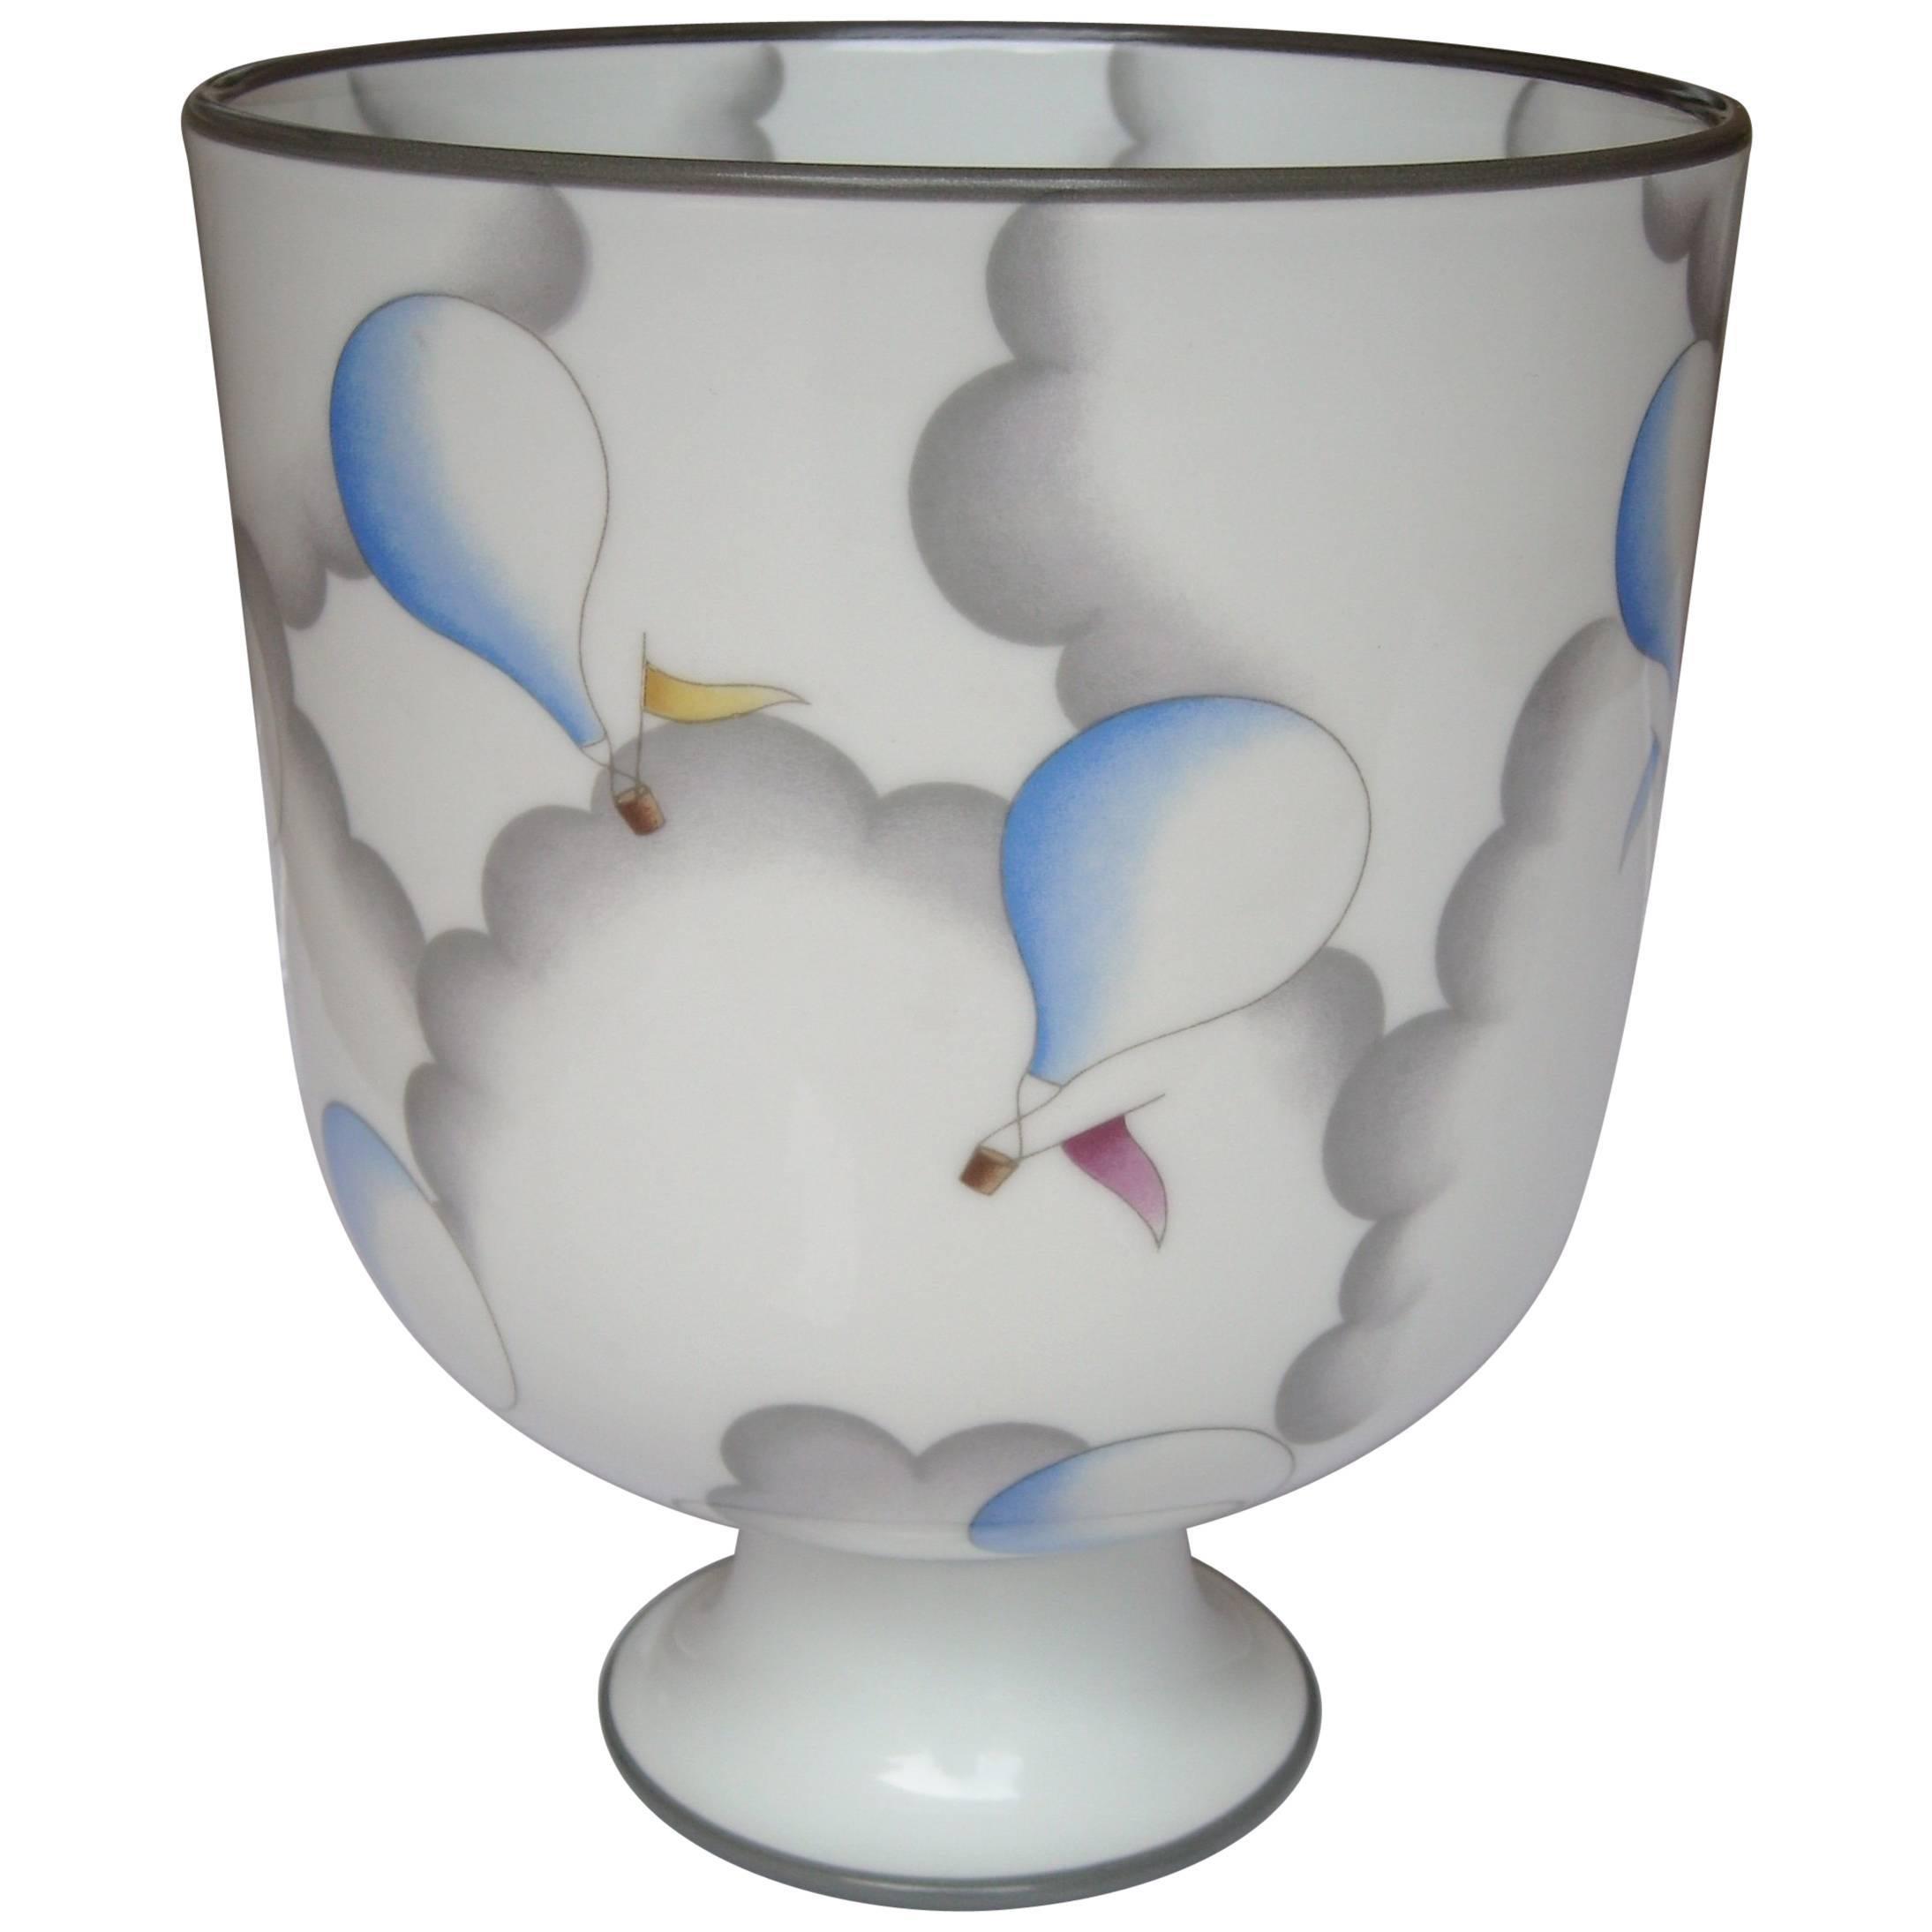 Gio Ponti Ceramic Vase or Urn for Richard Ginori, Signed